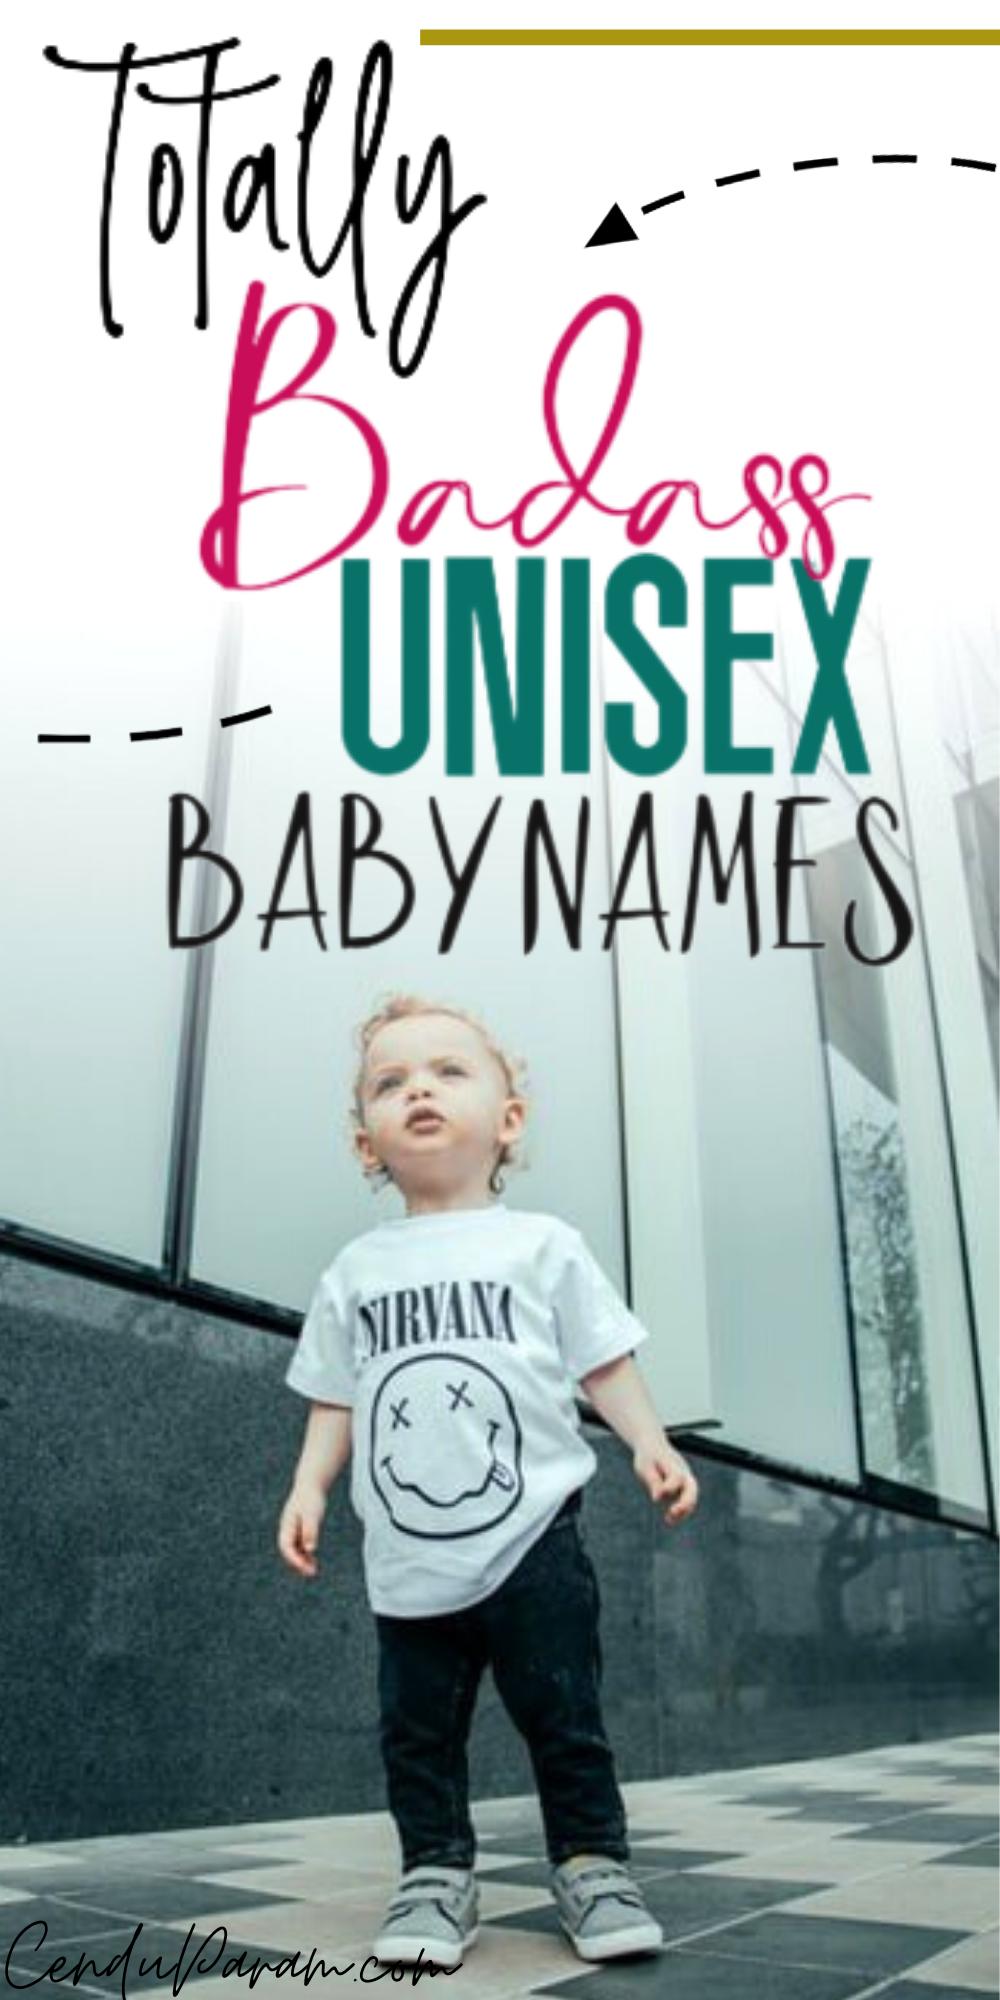 Cutest Unisex Gender Neutral Baby Names